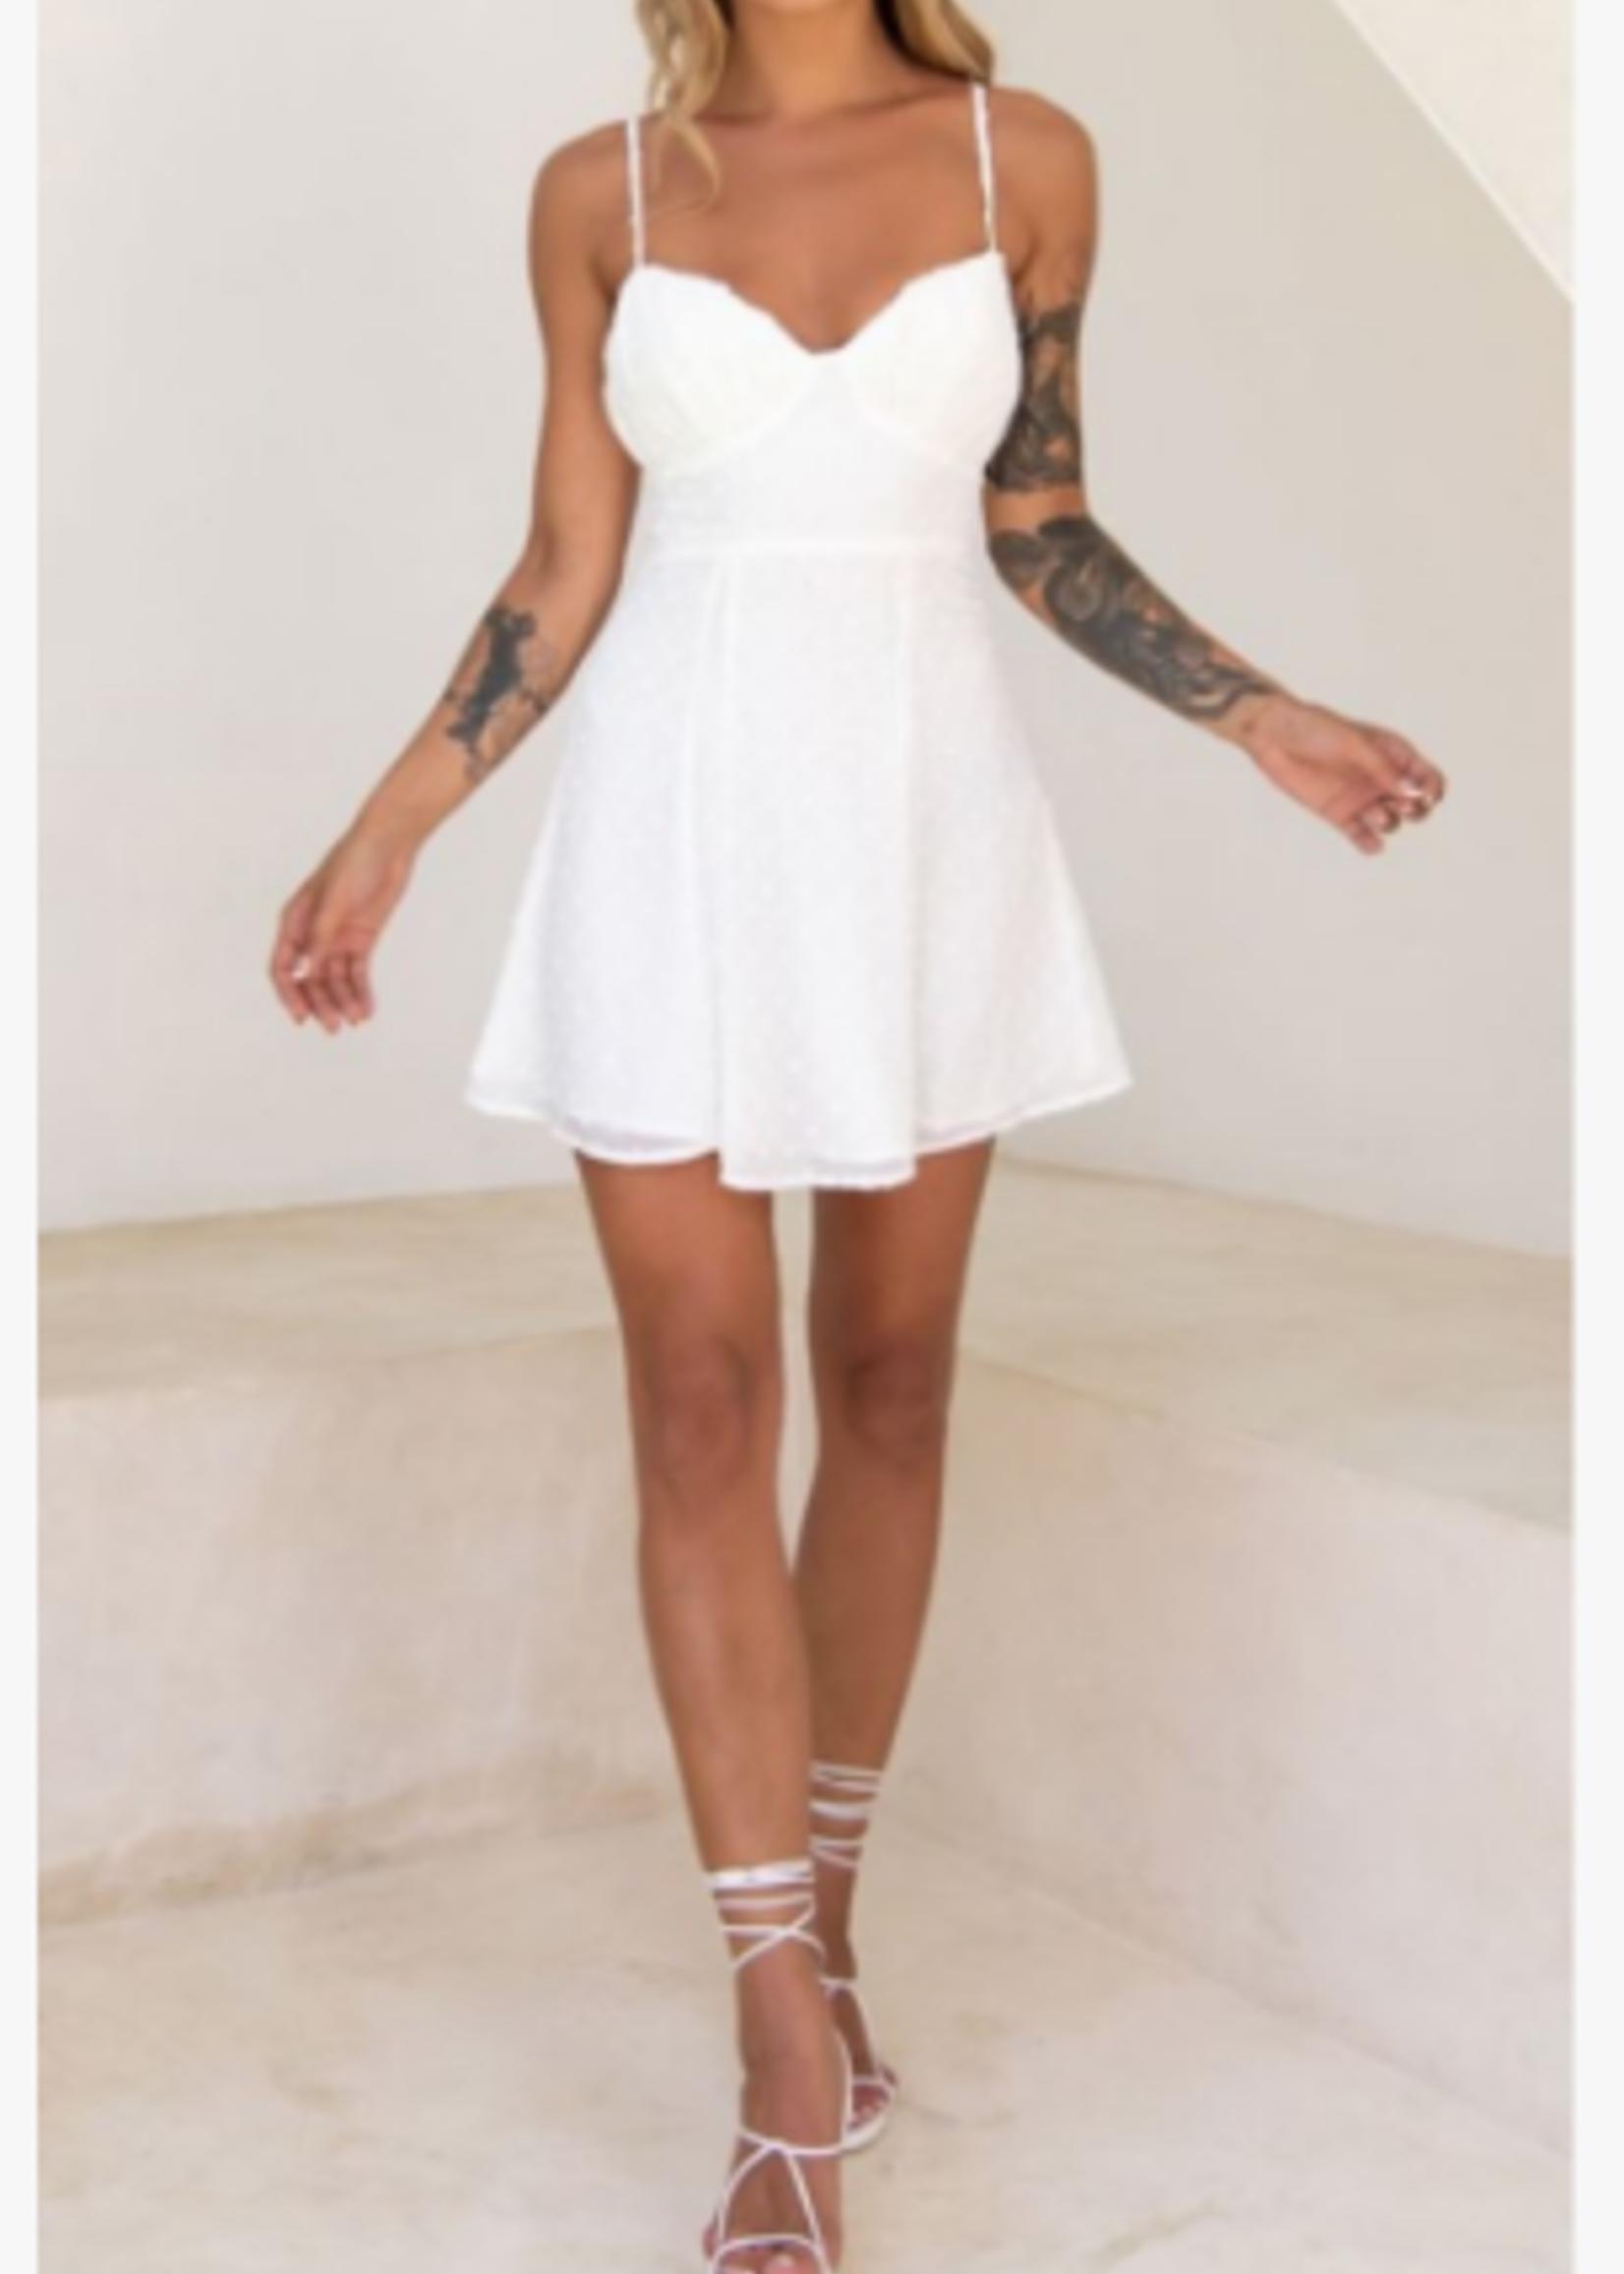 Sweet Summer Romance Dress (2 Colors)